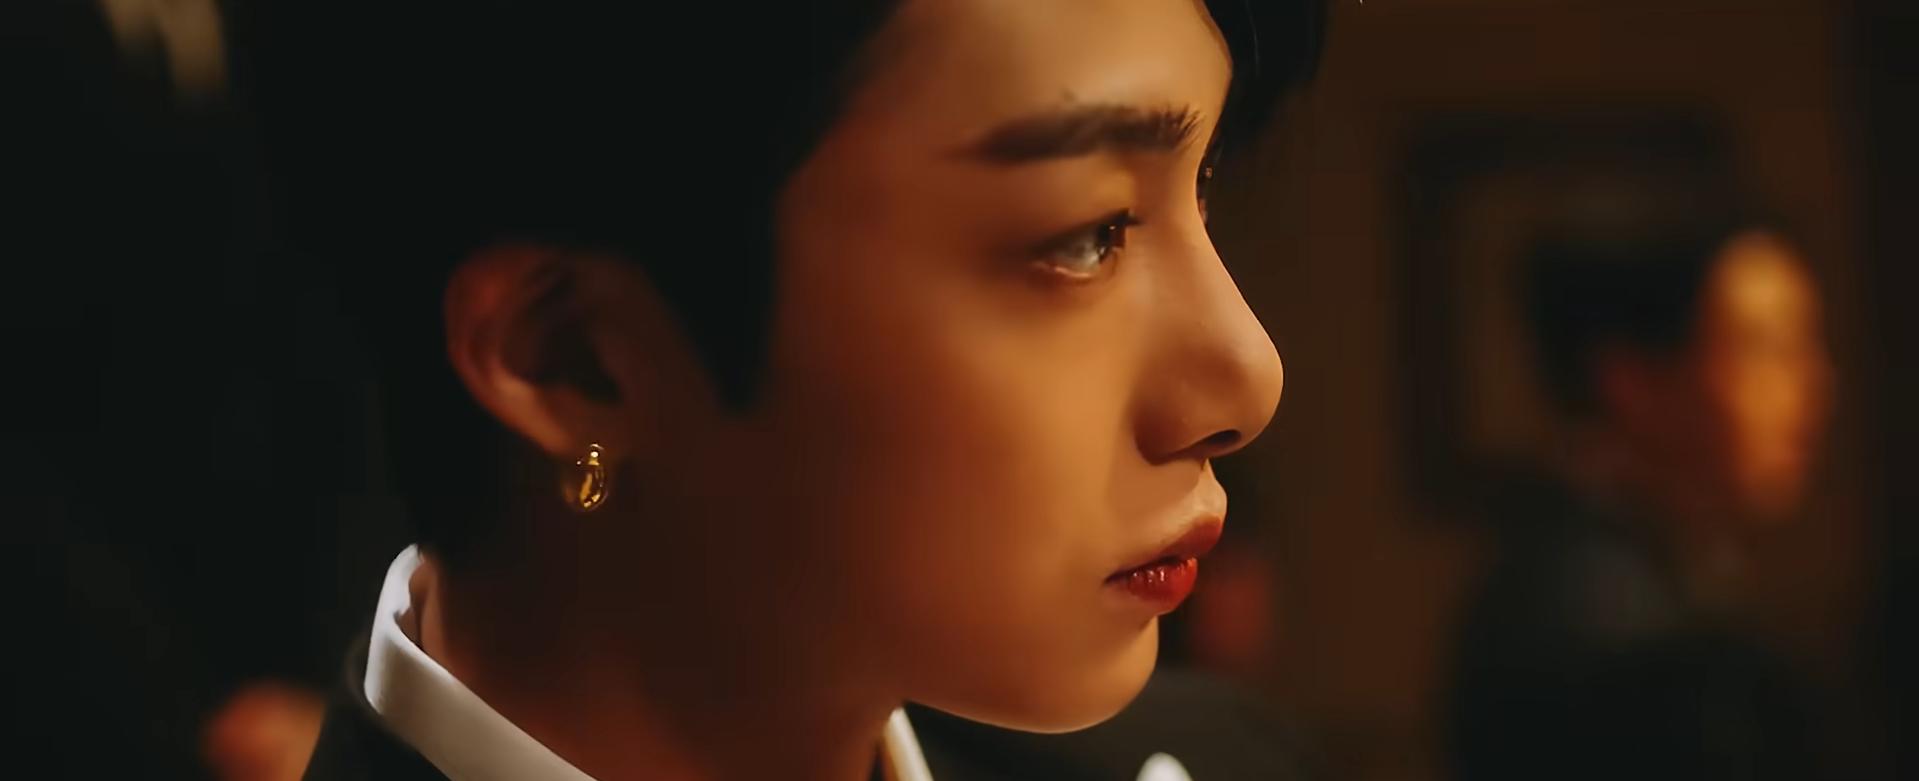 hyunwon1